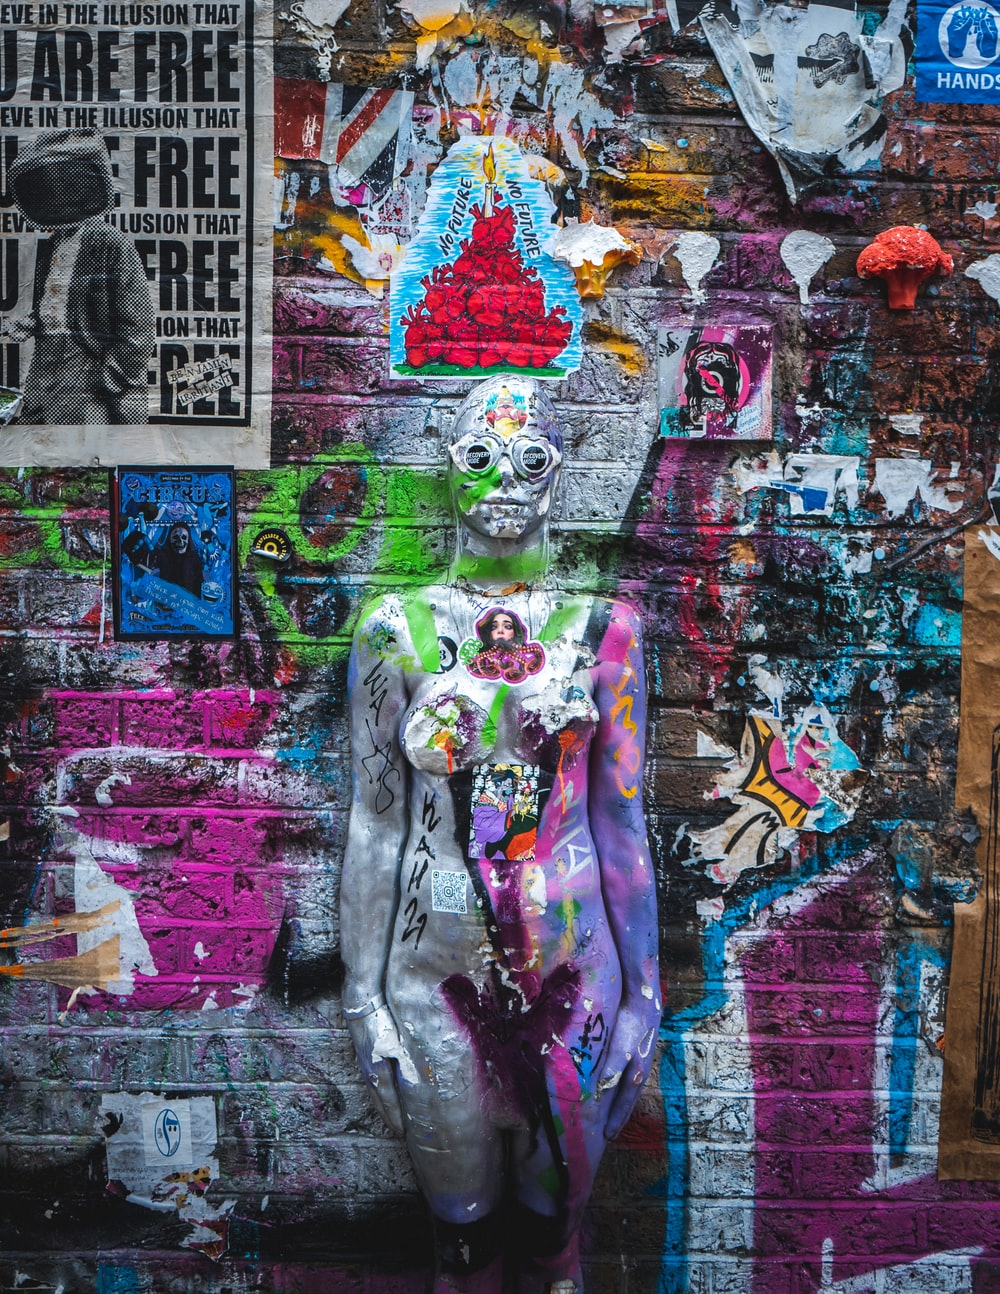 woman in gray jacket and purple pants standing beside graffiti wall